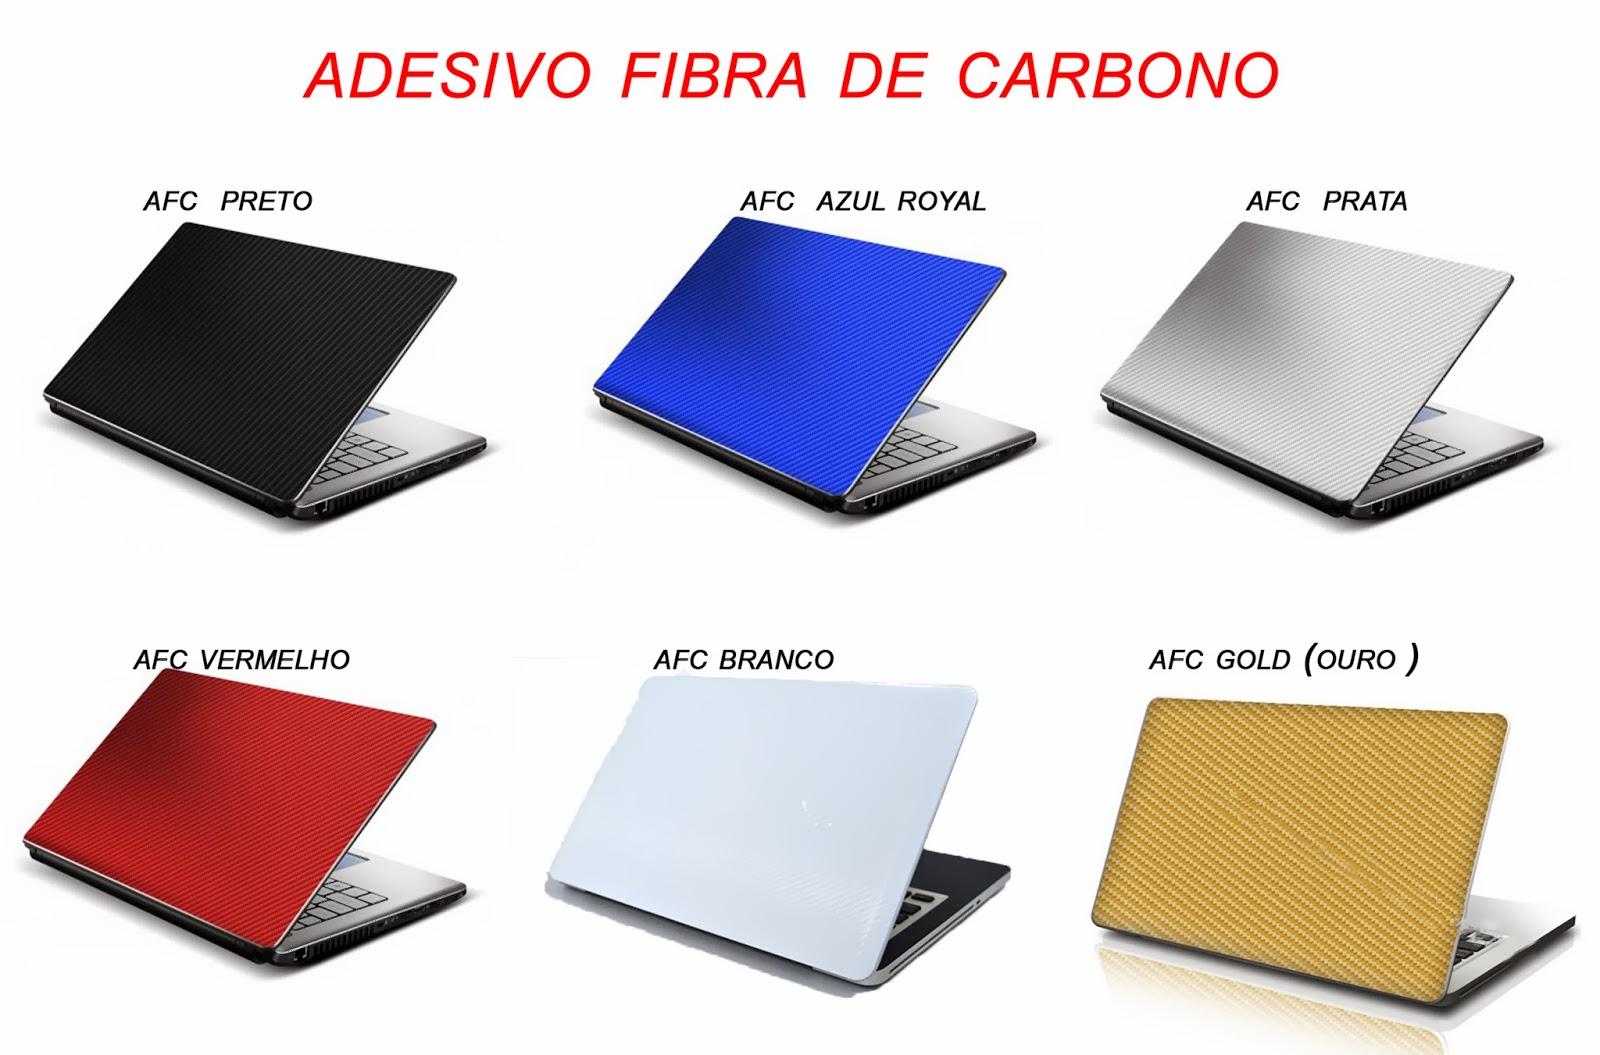 Adesivo Queimador De Gordura Peixe Urbano ~ Adesivo Skin Para Notebook 14 Fibra De Carbono R$19 99 fsOyH Precio D Brasil